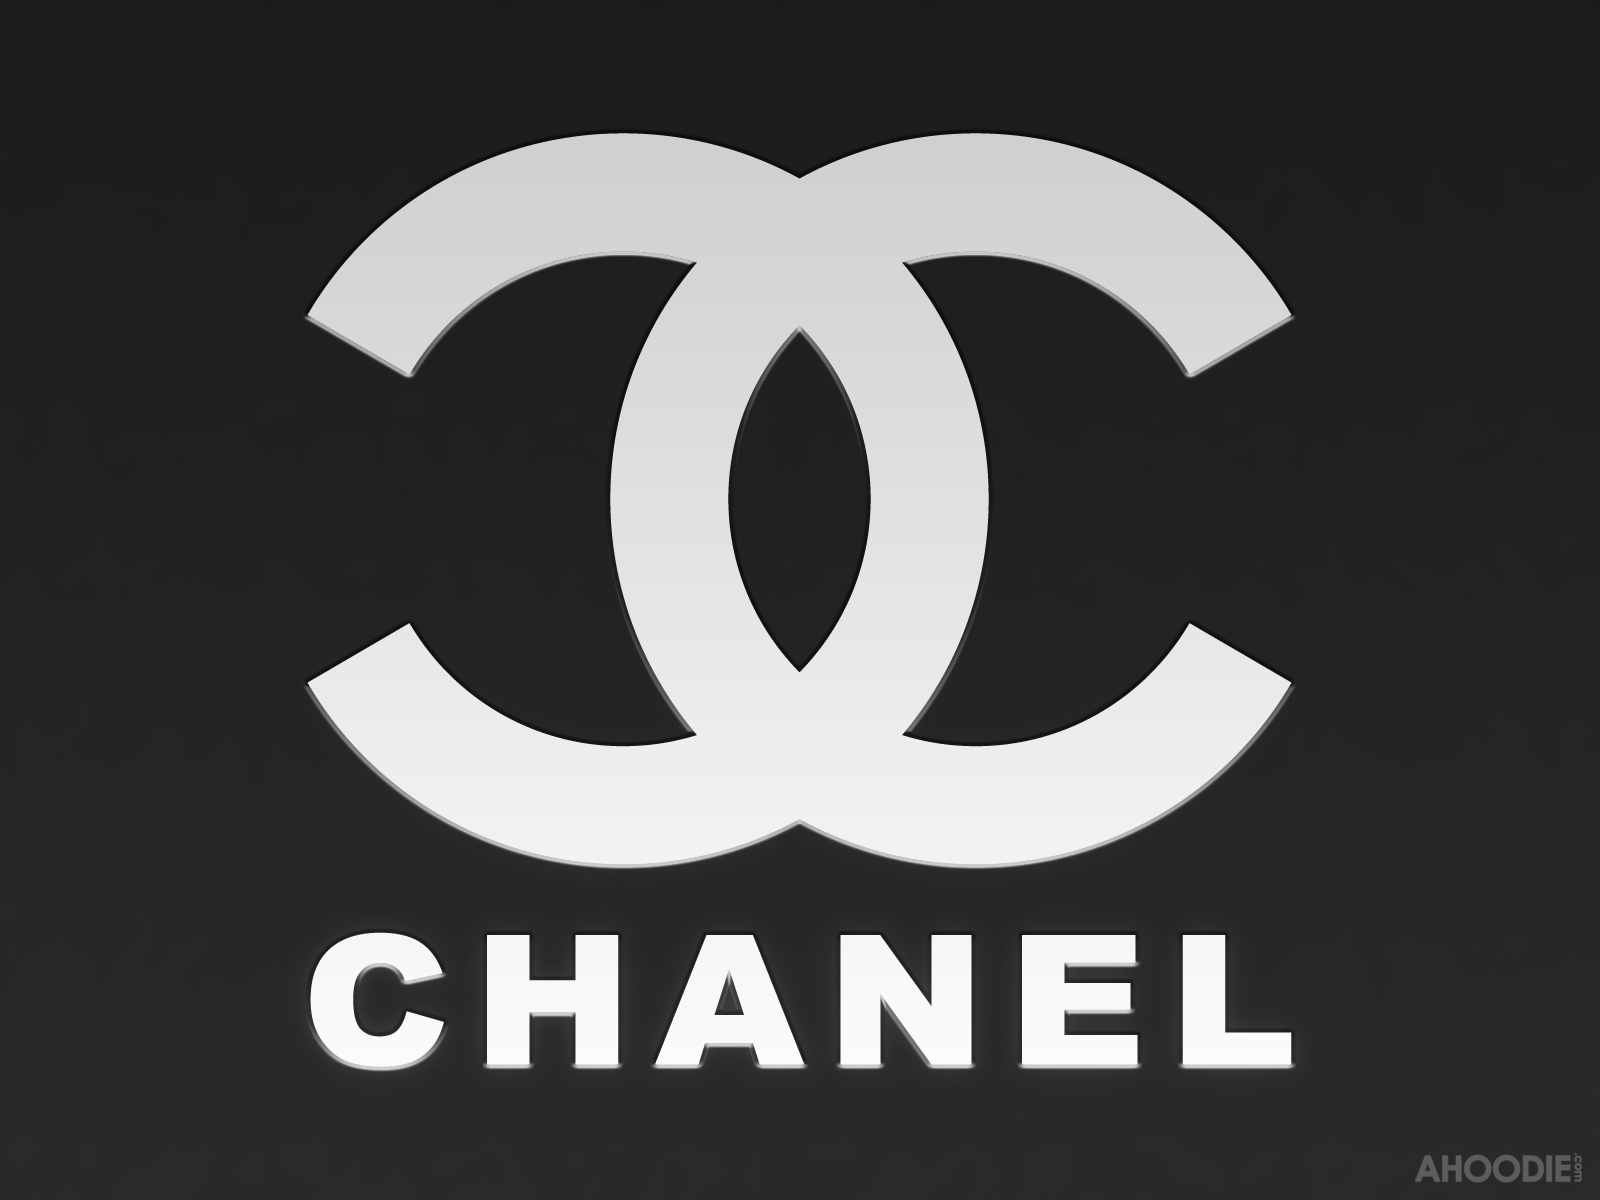 http://1.bp.blogspot.com/_OEXXfZ19NLo/TRfhNXaG4aI/AAAAAAAAFUk/fkRsRgwVj_g/s1600/chanel_wallpapers_logo_quality11.jpg